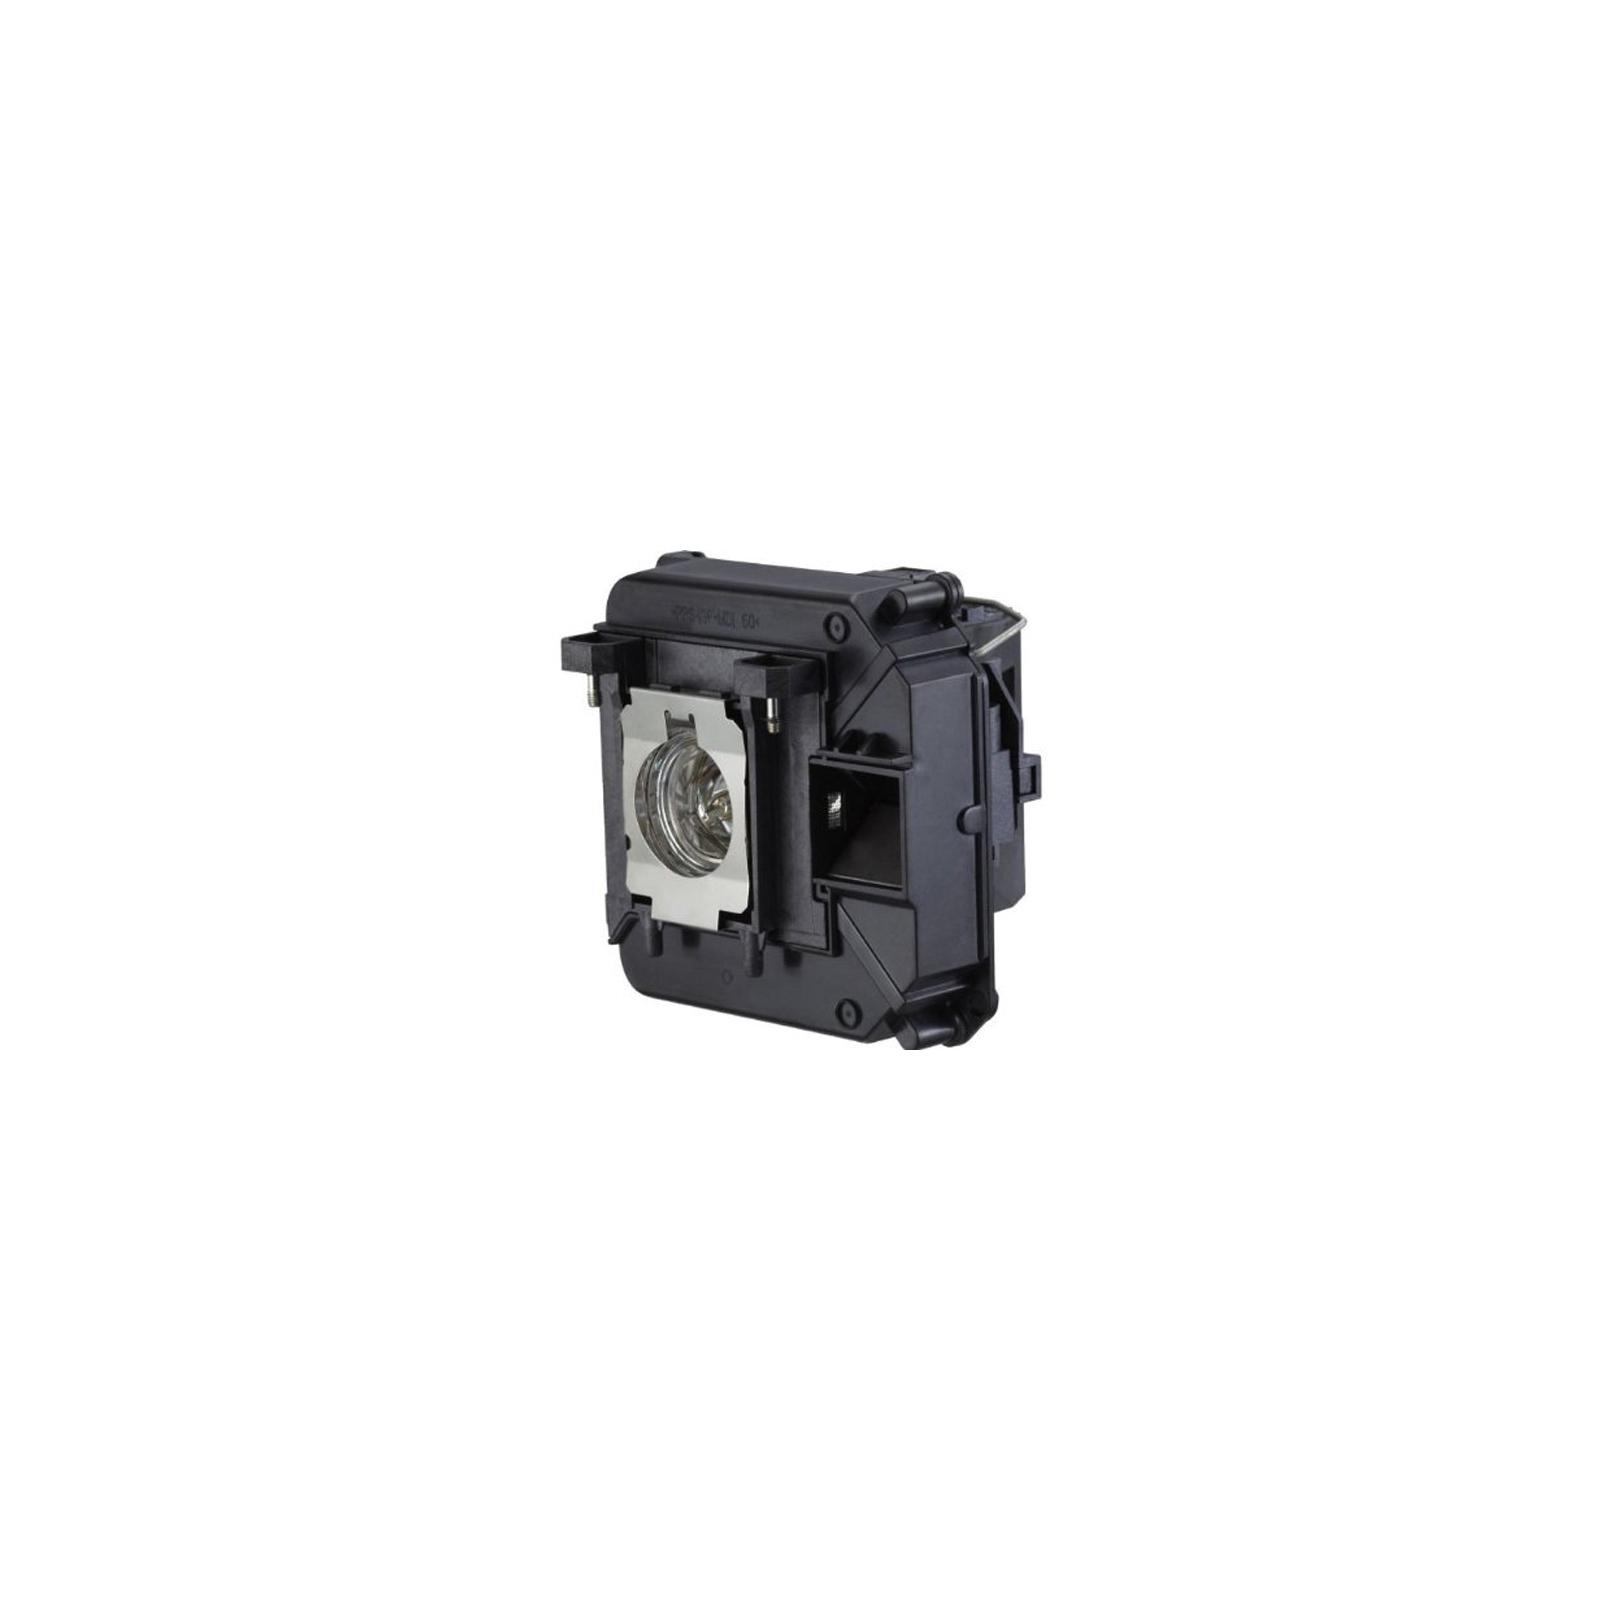 Лампа проектора EPSON L68 (V13H010L68)